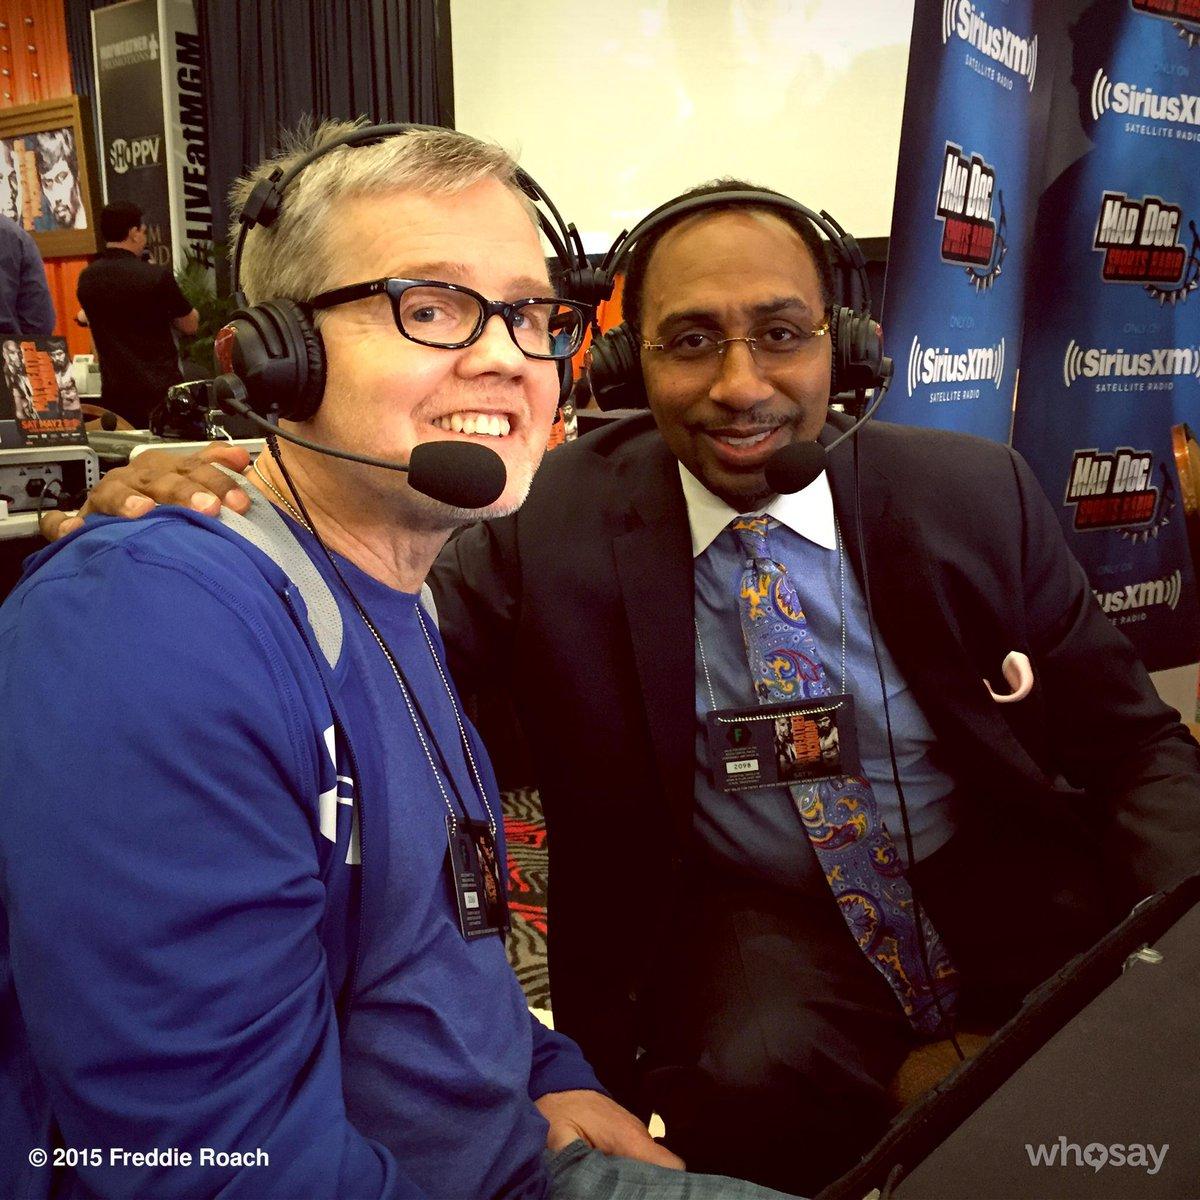 Doing radio row interviews with @stephenasmith #maypac http://t.co/IixFPDi3xA